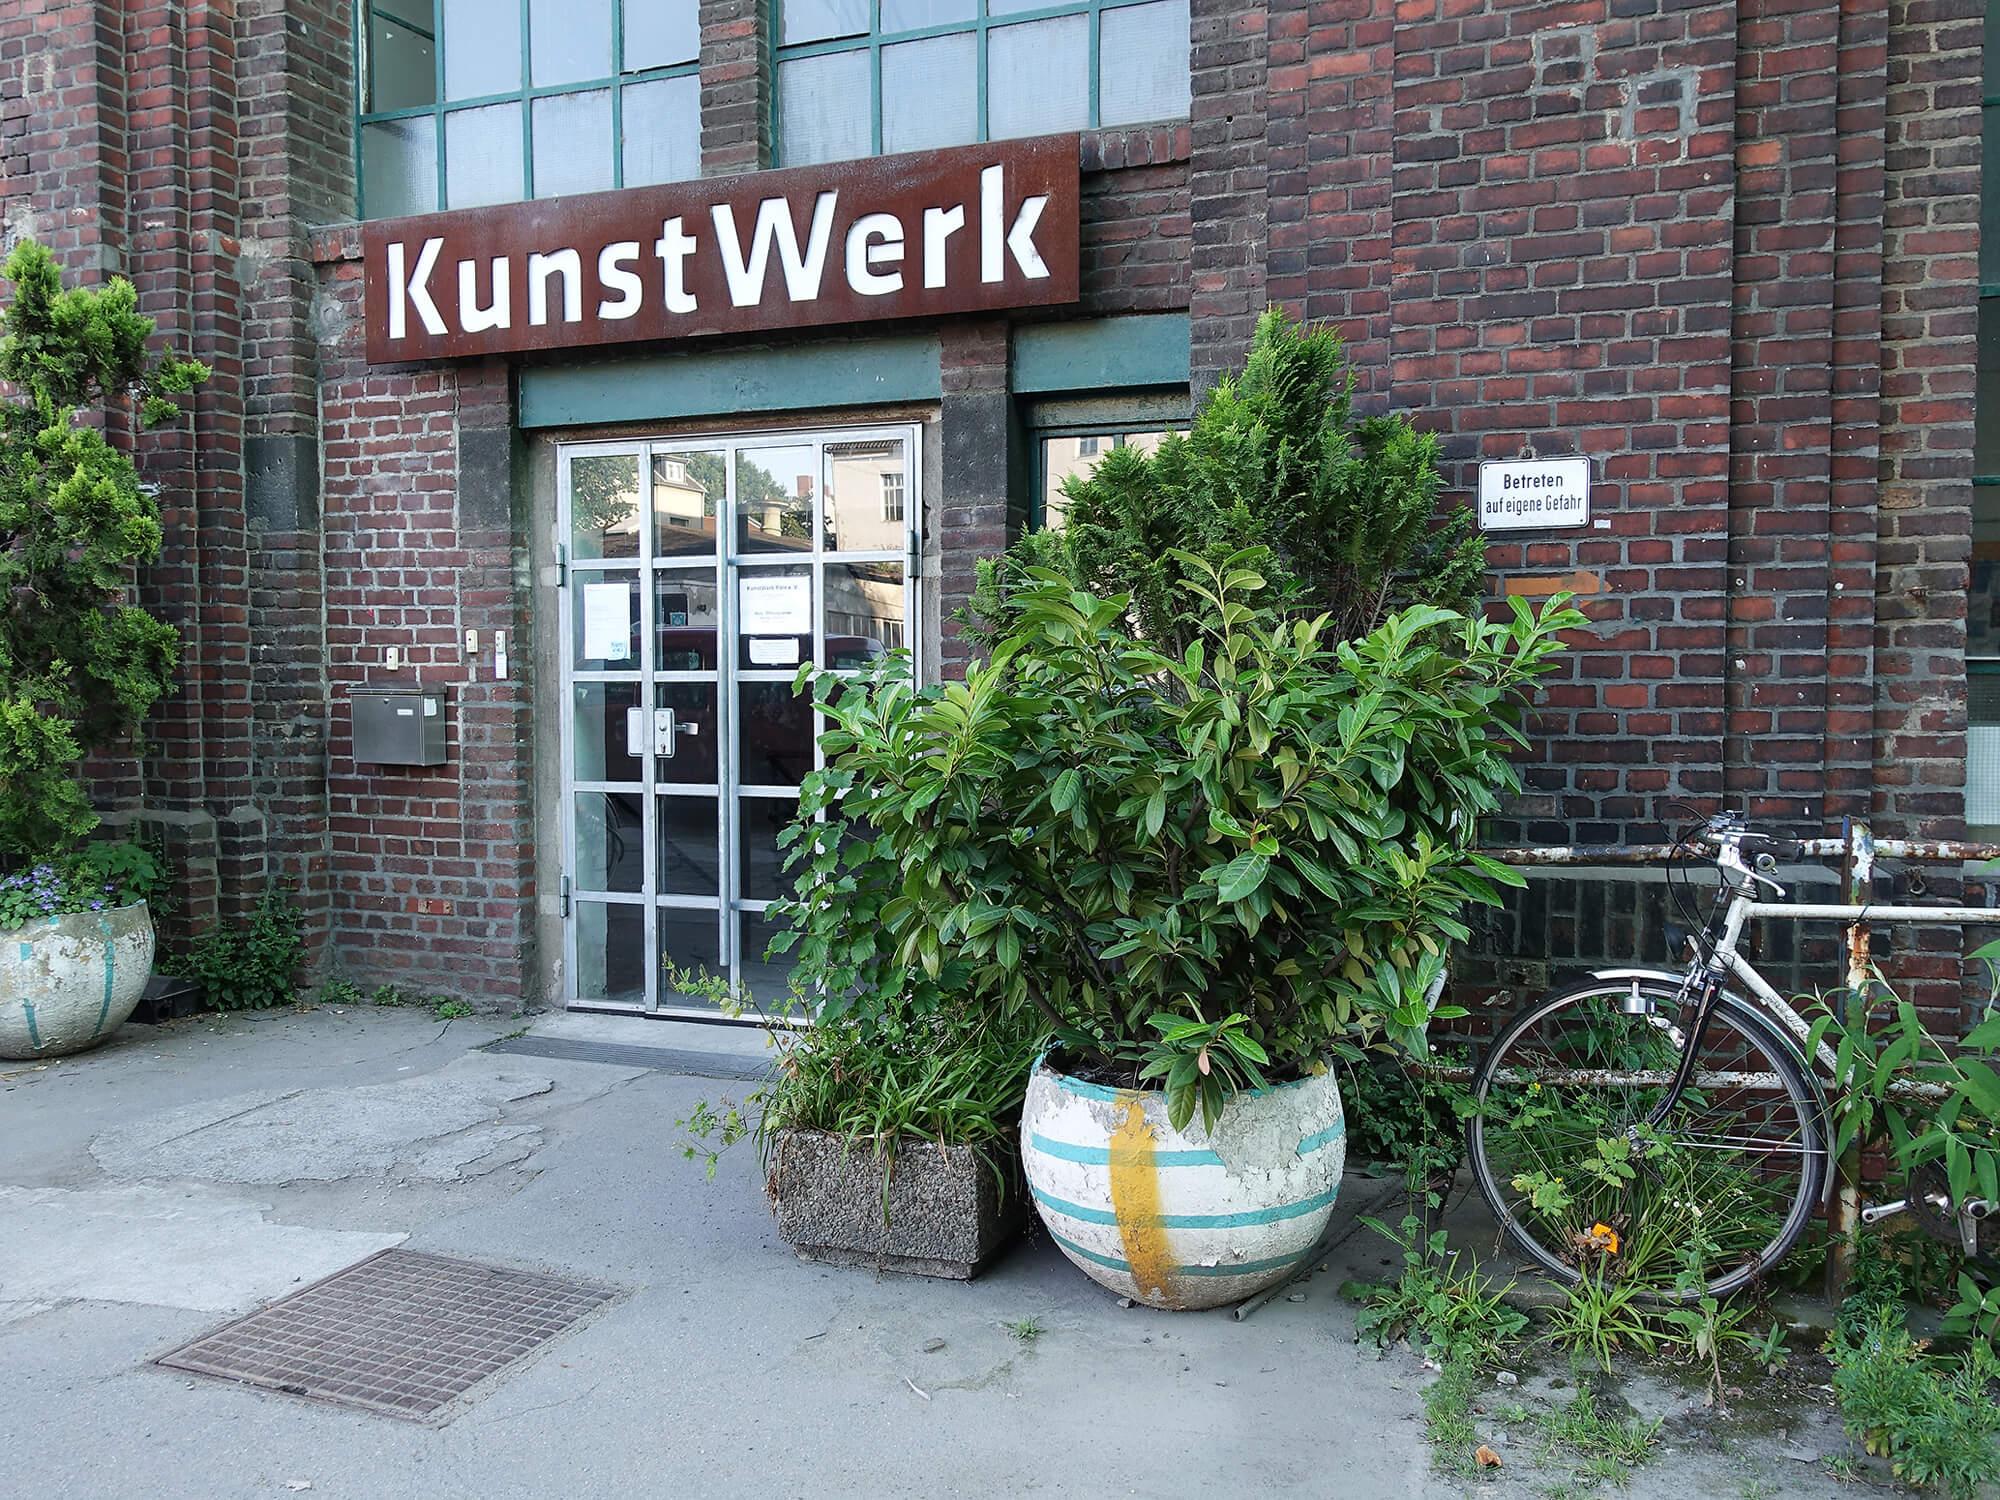 Museumsnacht Köln 2019: KunstWerk, ©Vildan Weckbach